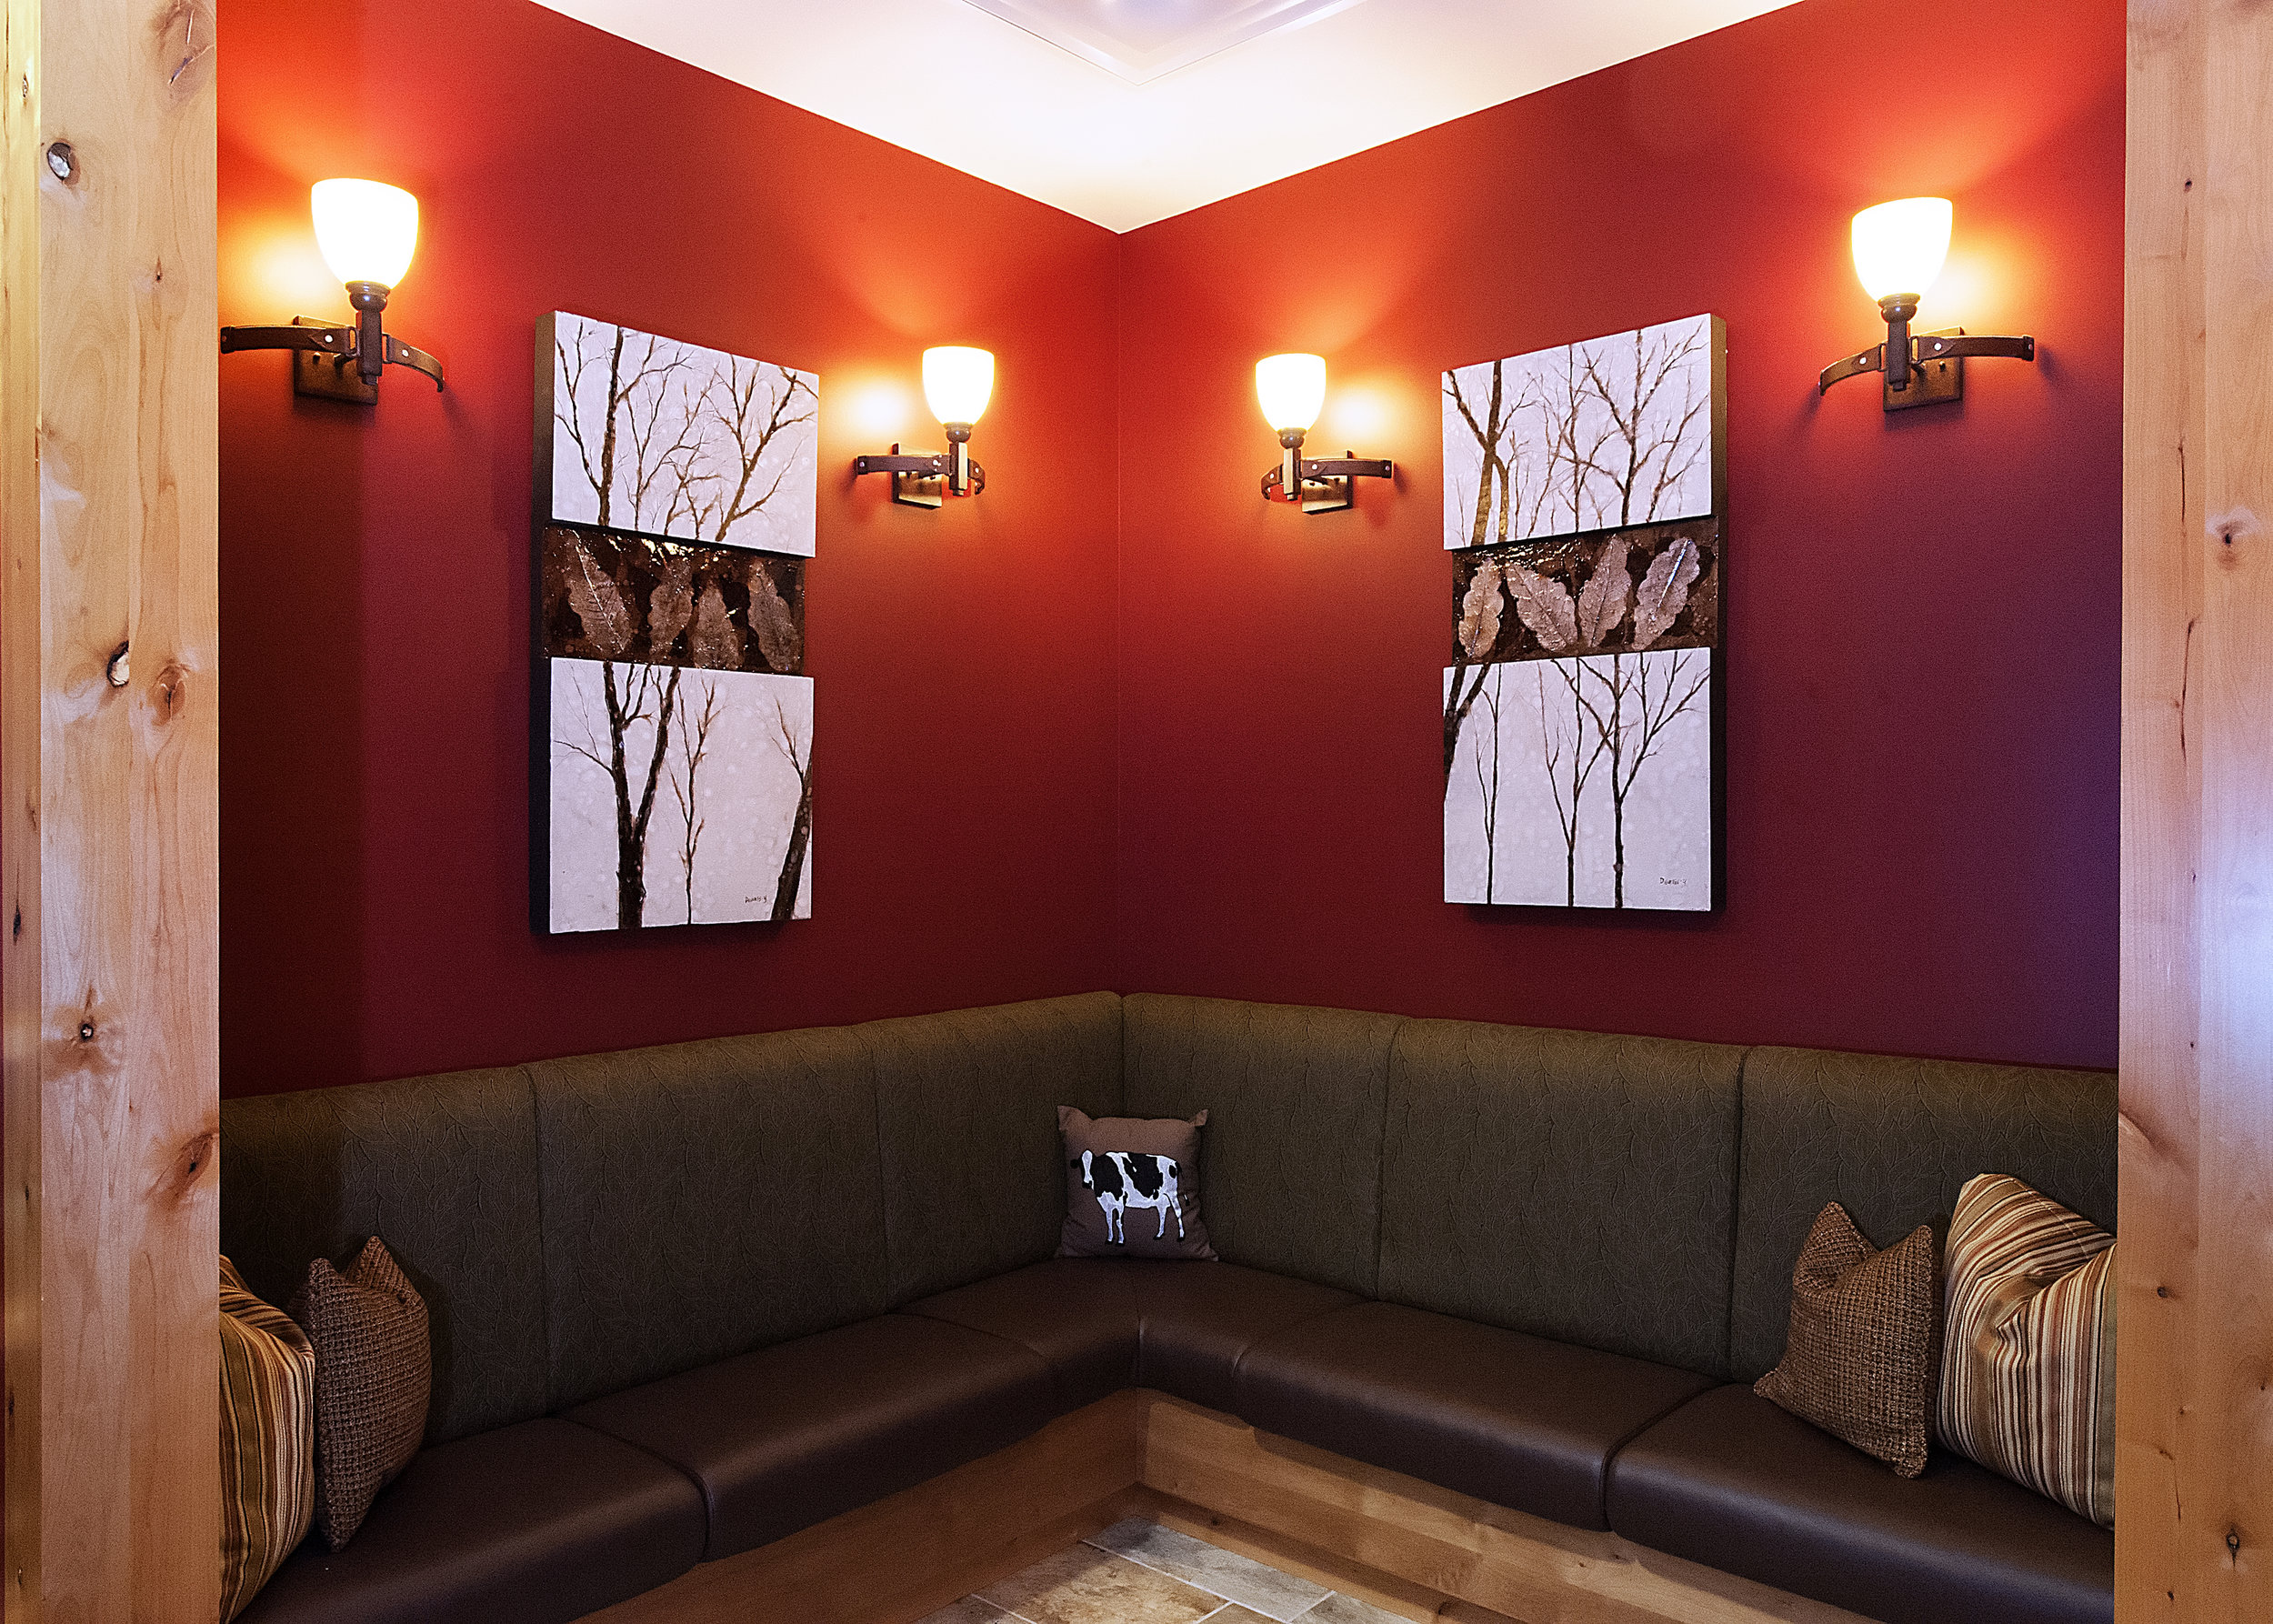 Linda tomky Designs_071.jpg